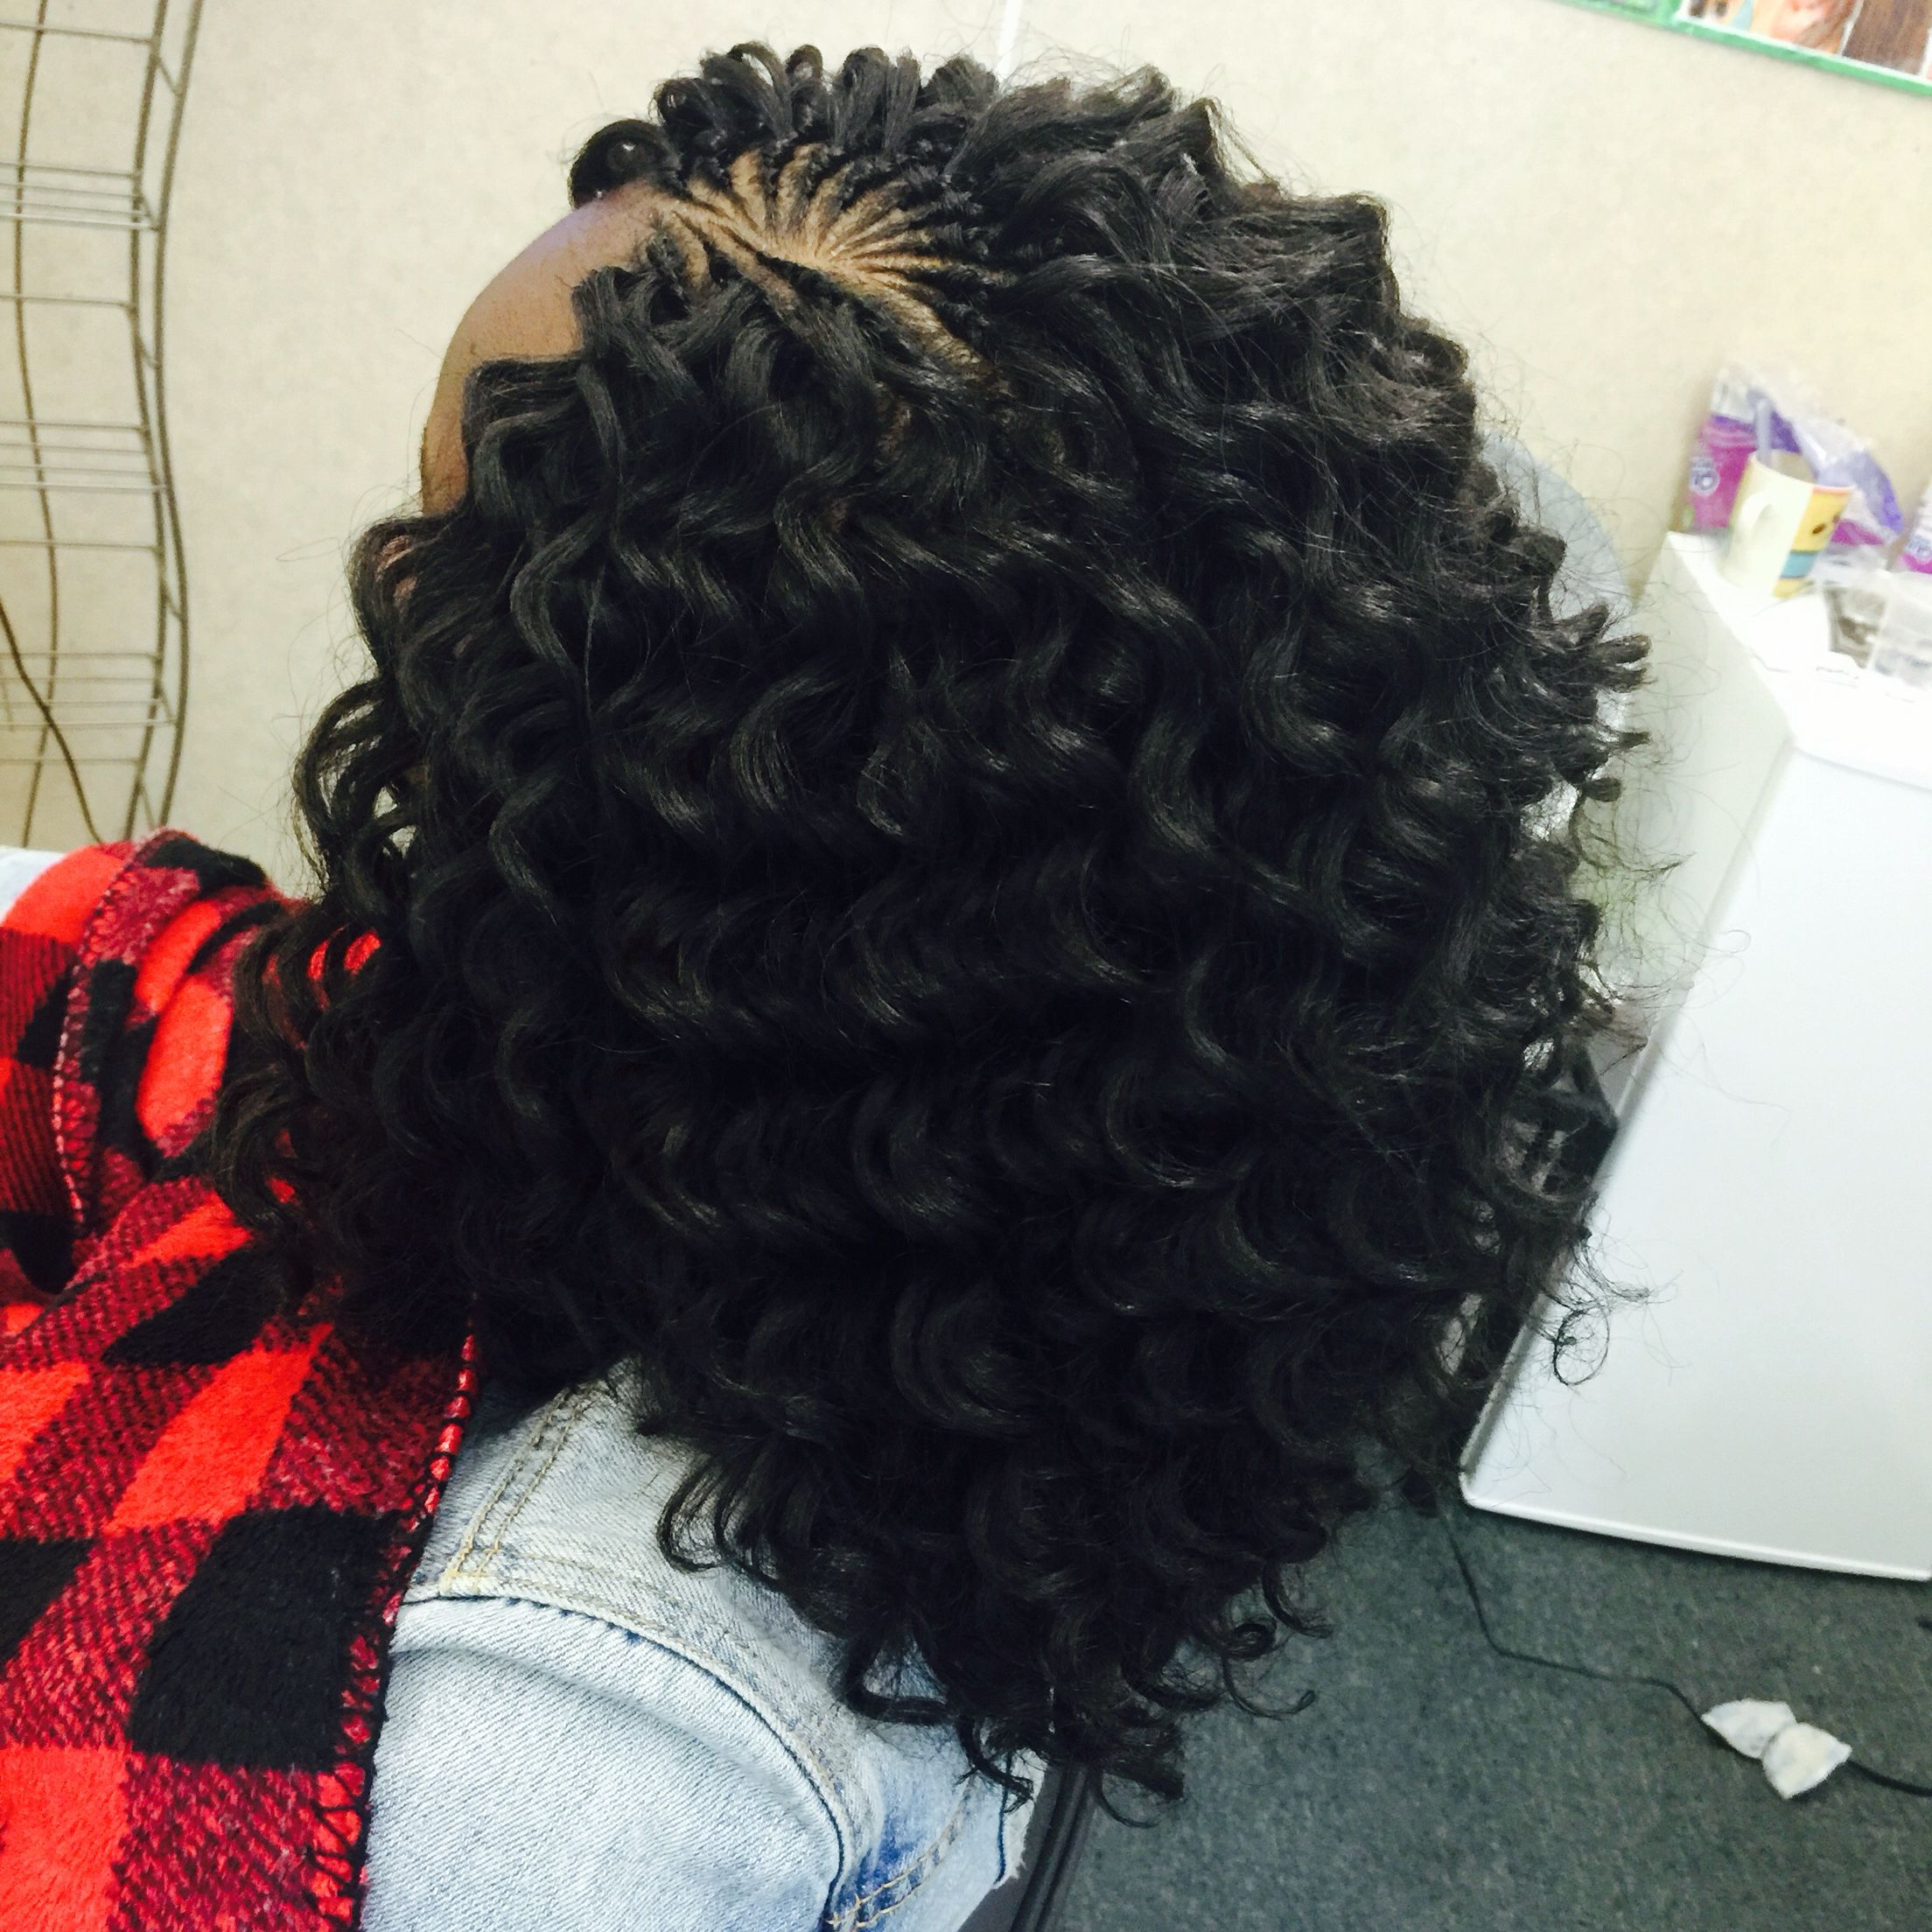 Chinnys Hair chinnyshair on Pinterest